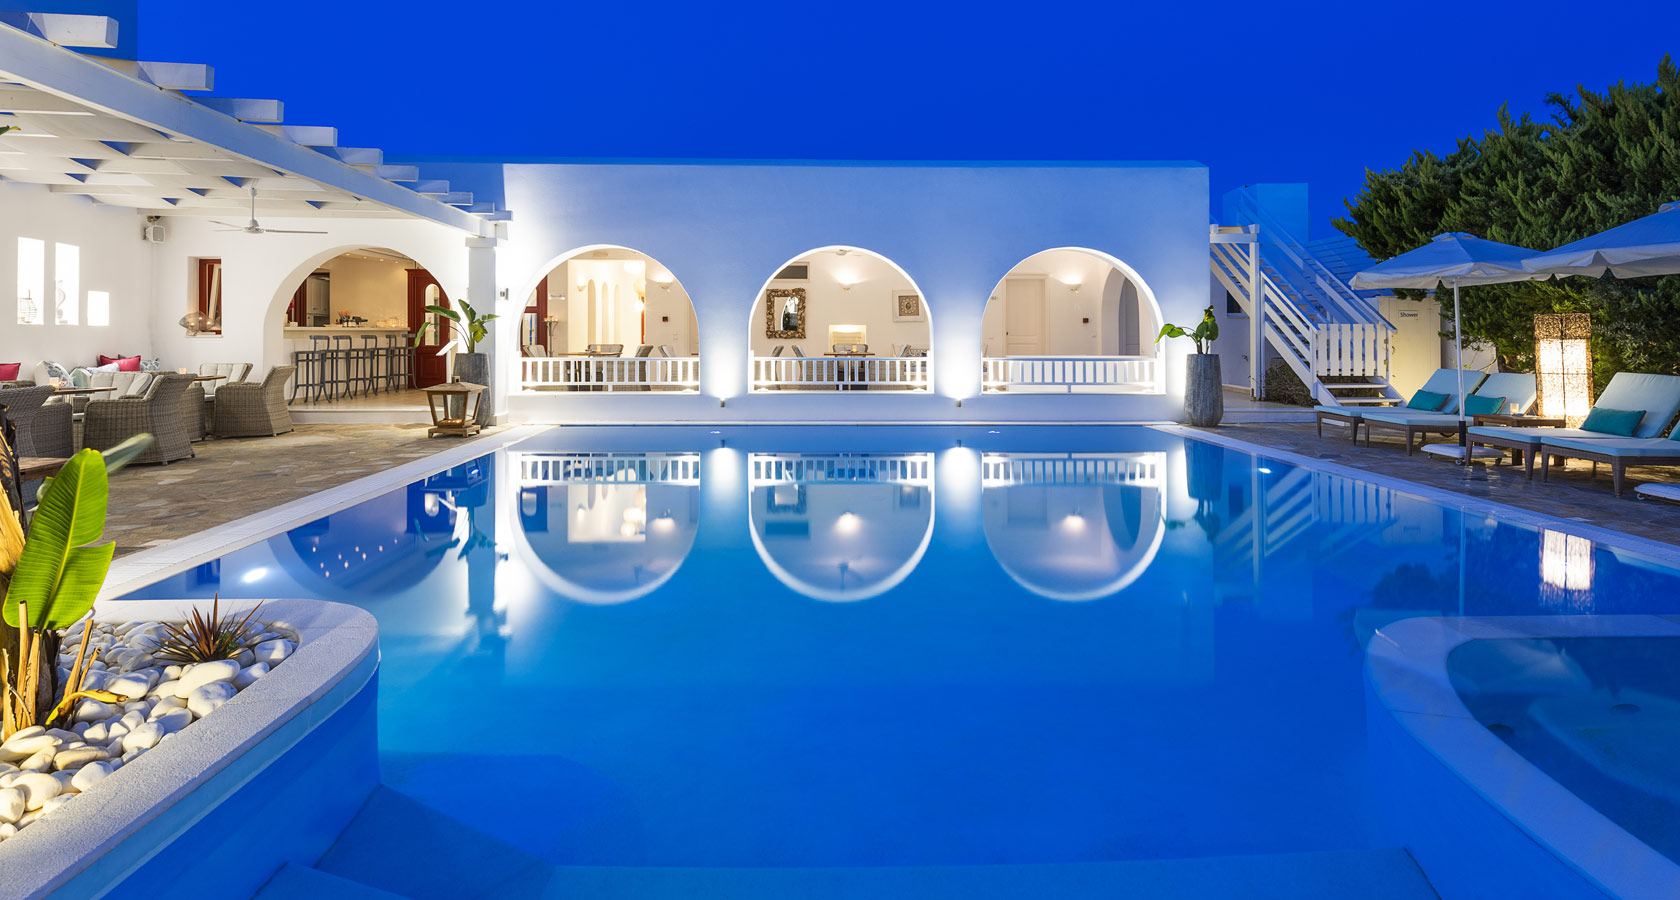 Stelia Mare Hotel in Paros – The pool